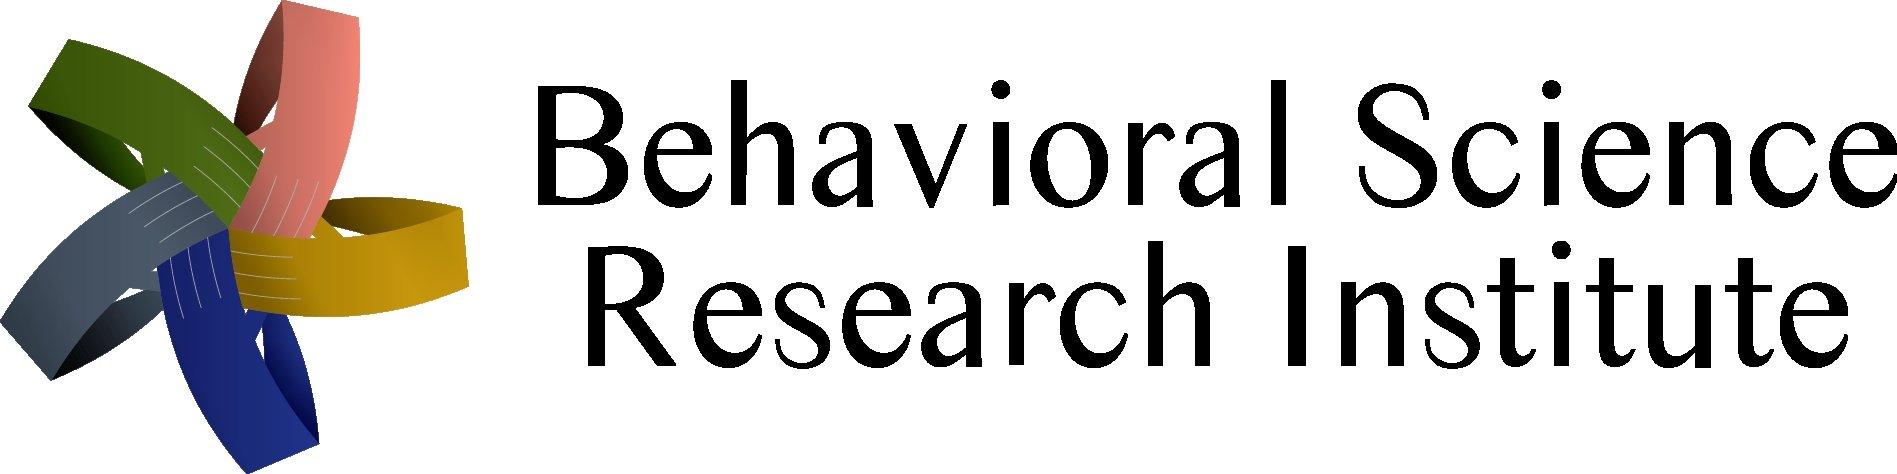 Behavioral Science Research Institute